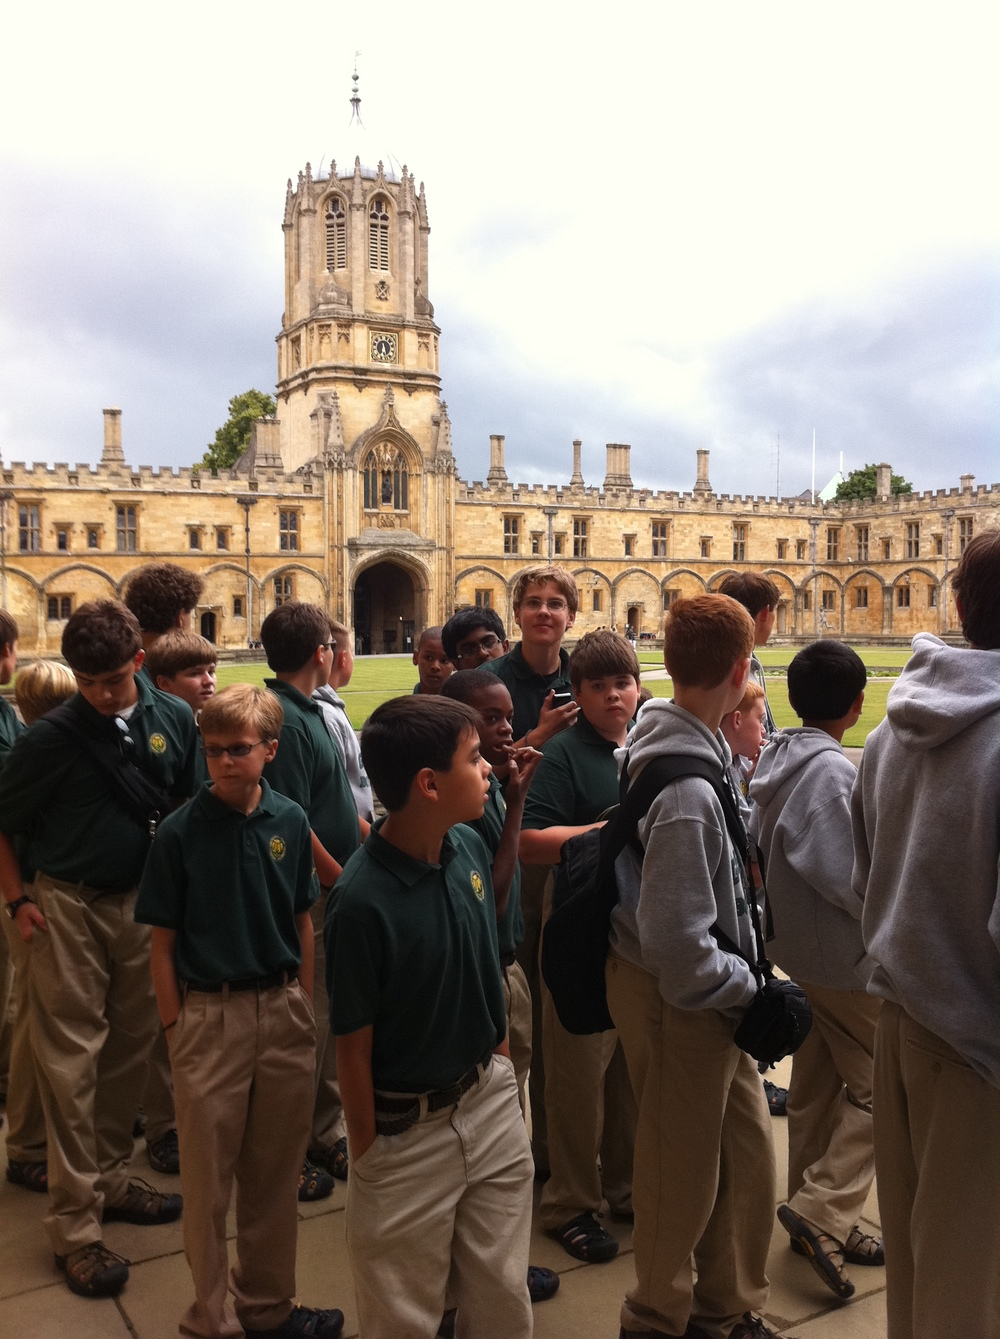 The Georgia Boy Choir at Christ Church Cathedral, Oxford, England